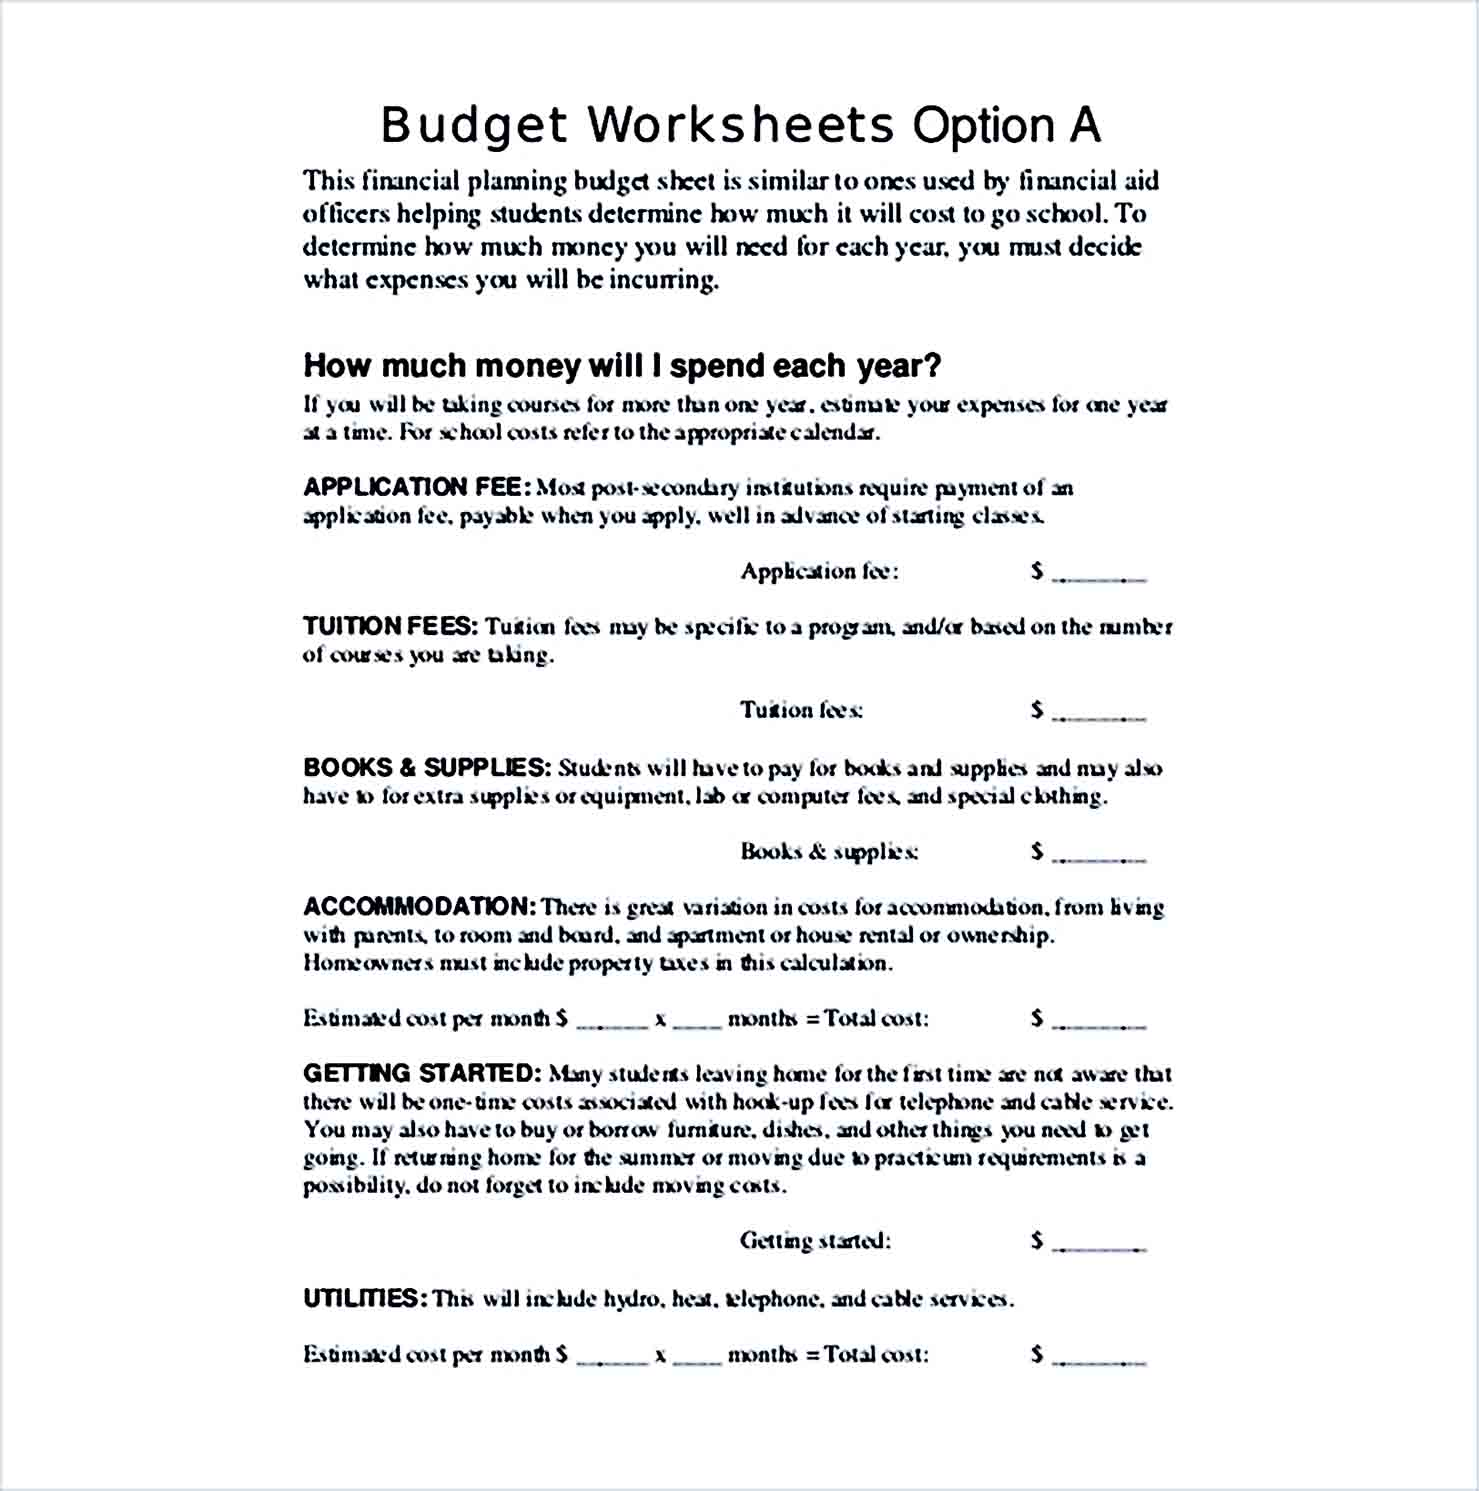 Sample FINANCIAL PLANNING BUDGET SHEET